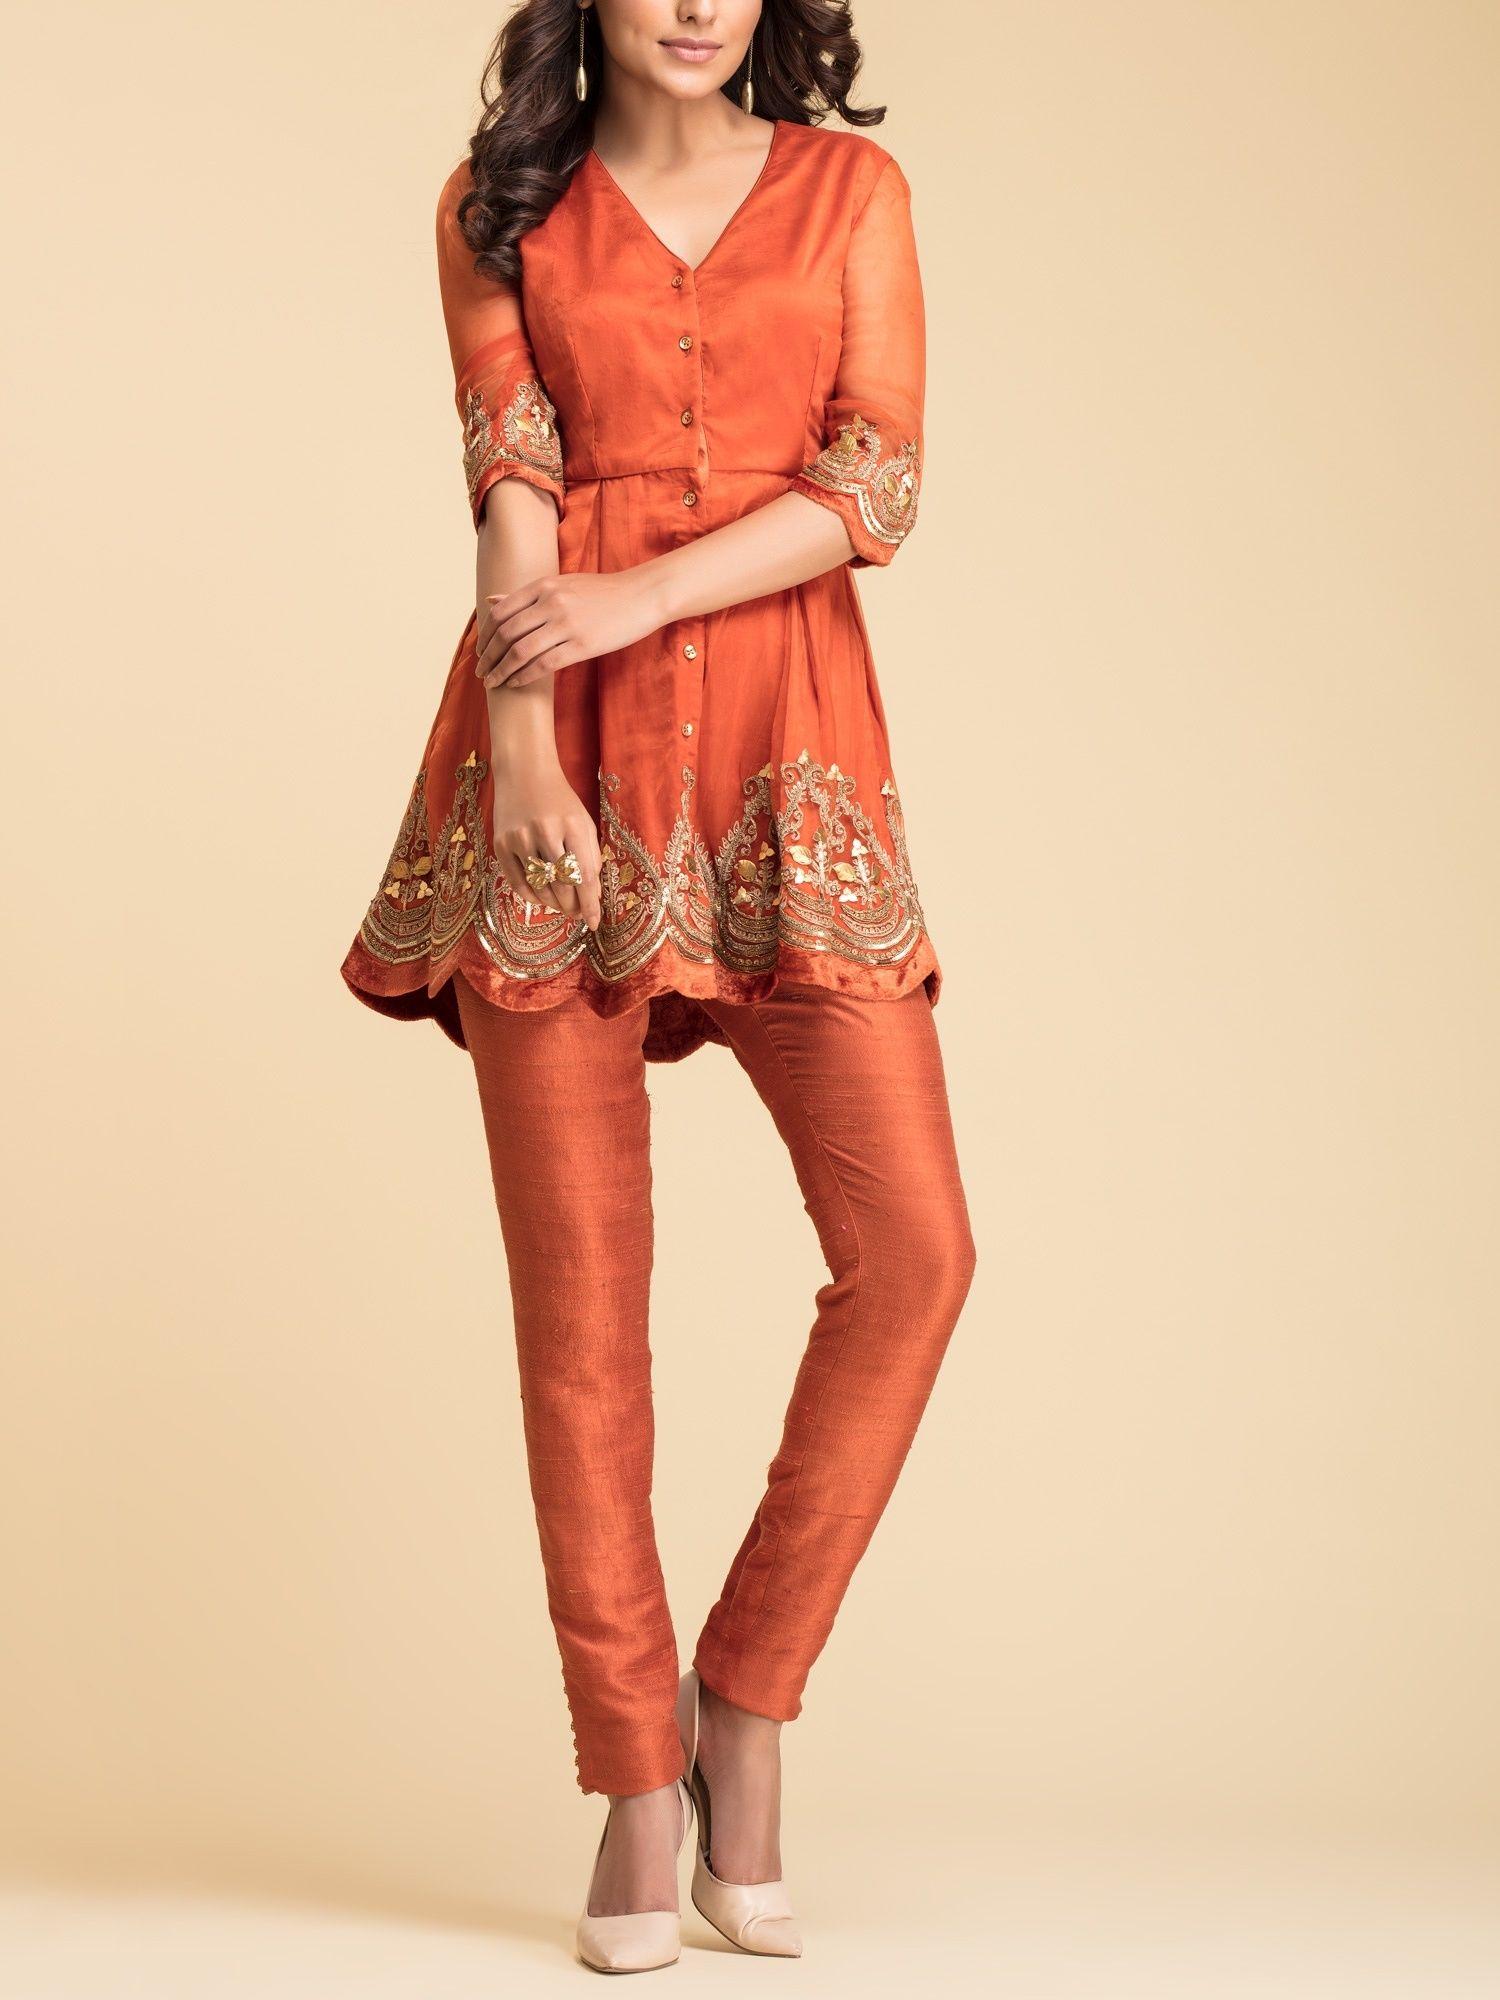 80a6cf74ad3 Avdi Kurtis Kurtas and Tunics : Buy Avdi Burnt Orange Embroidered ...